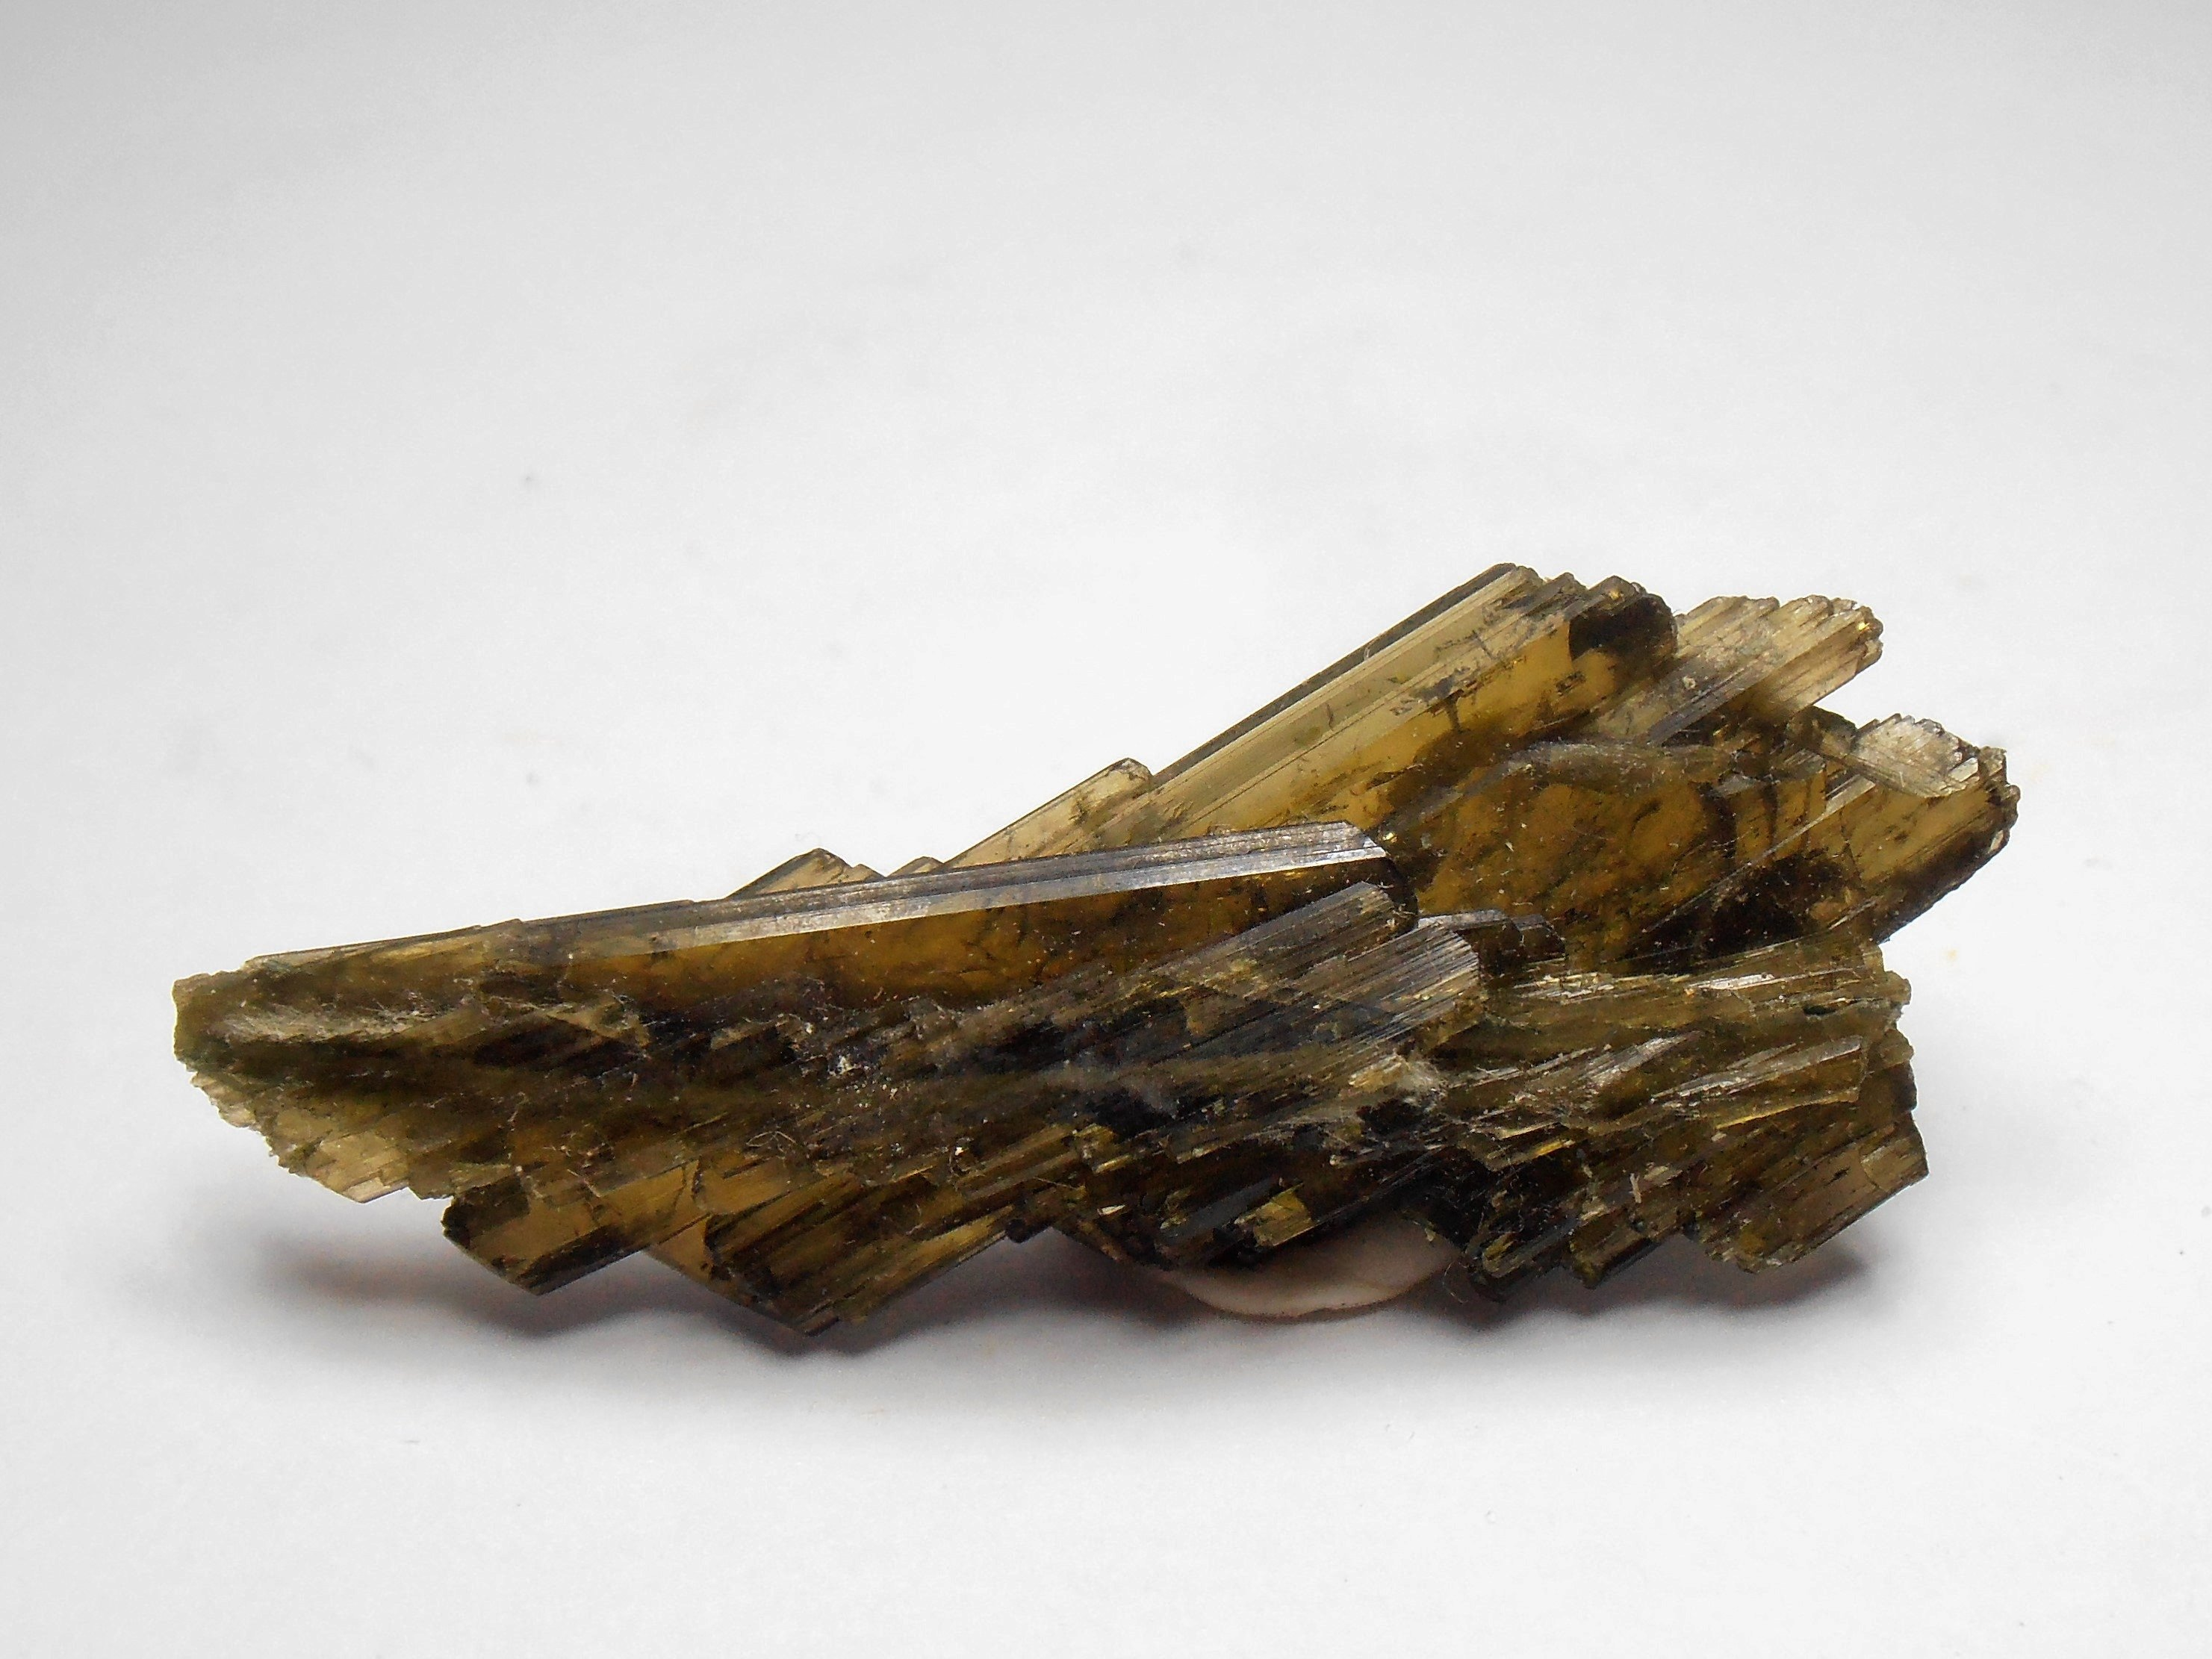 Epidote - Faden Crystals - from the Tormig Valley, Skardu District